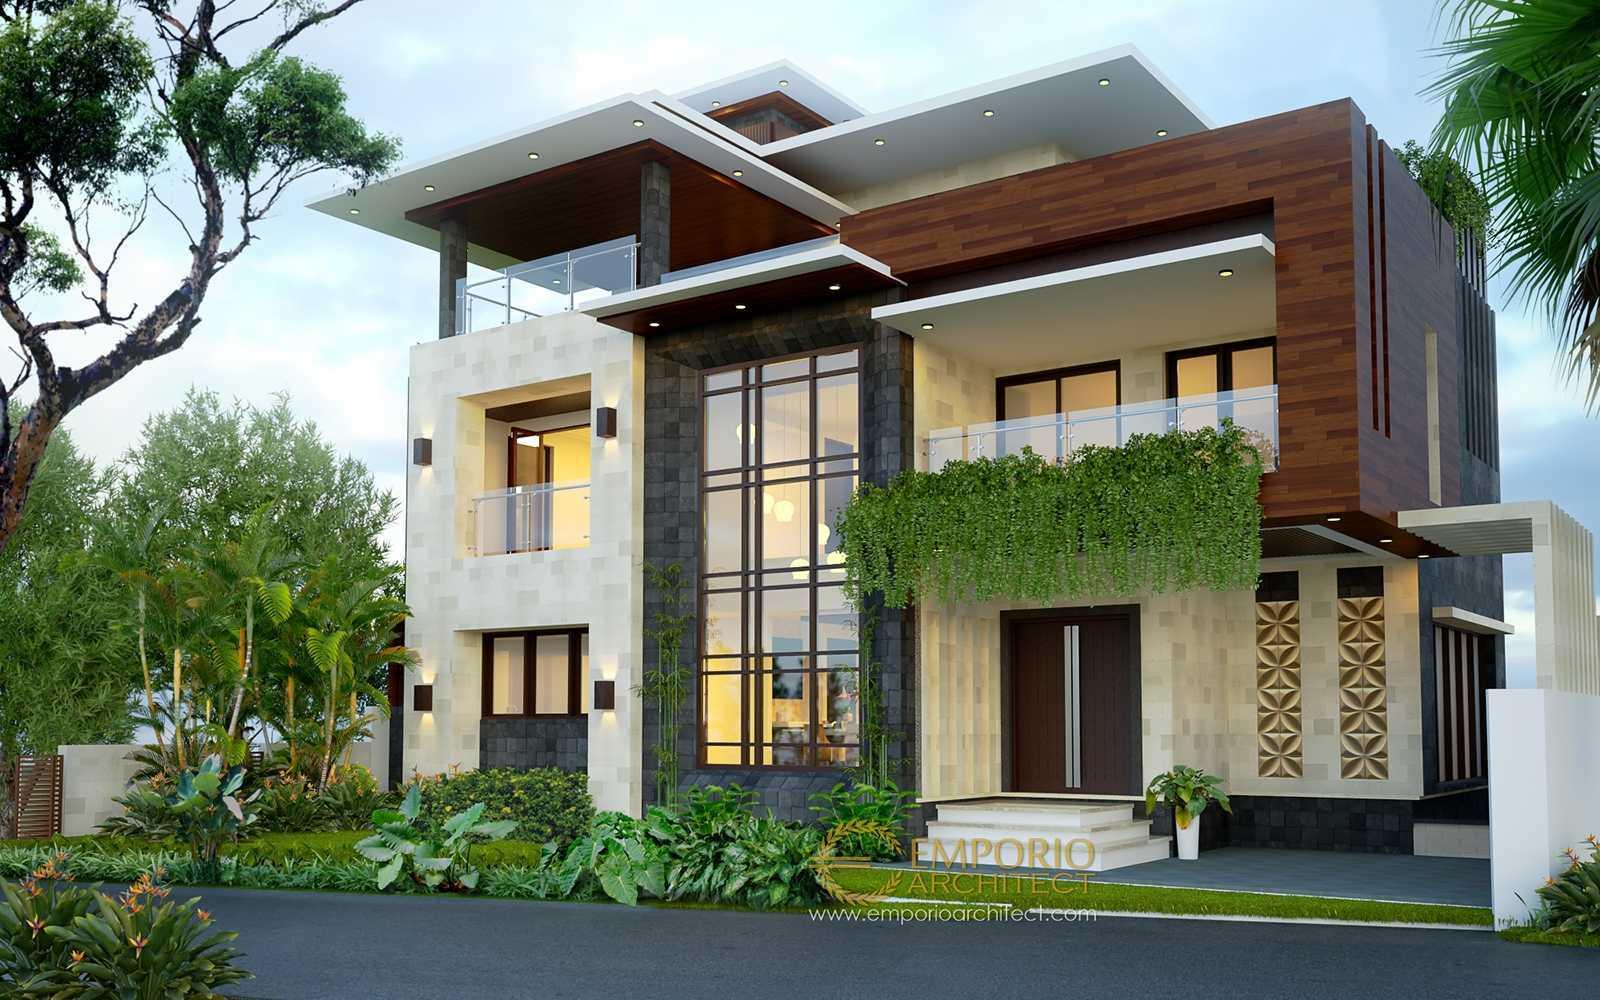 Emporio Architect Desain Rumah Modern Tropis 422 @ Banglore, India Bengaluru, Karnataka, India Bengaluru, Karnataka, India Emporio-Architect-Desain-Rumah-Modern-Tropis-422-Banglore-India Modern  74934